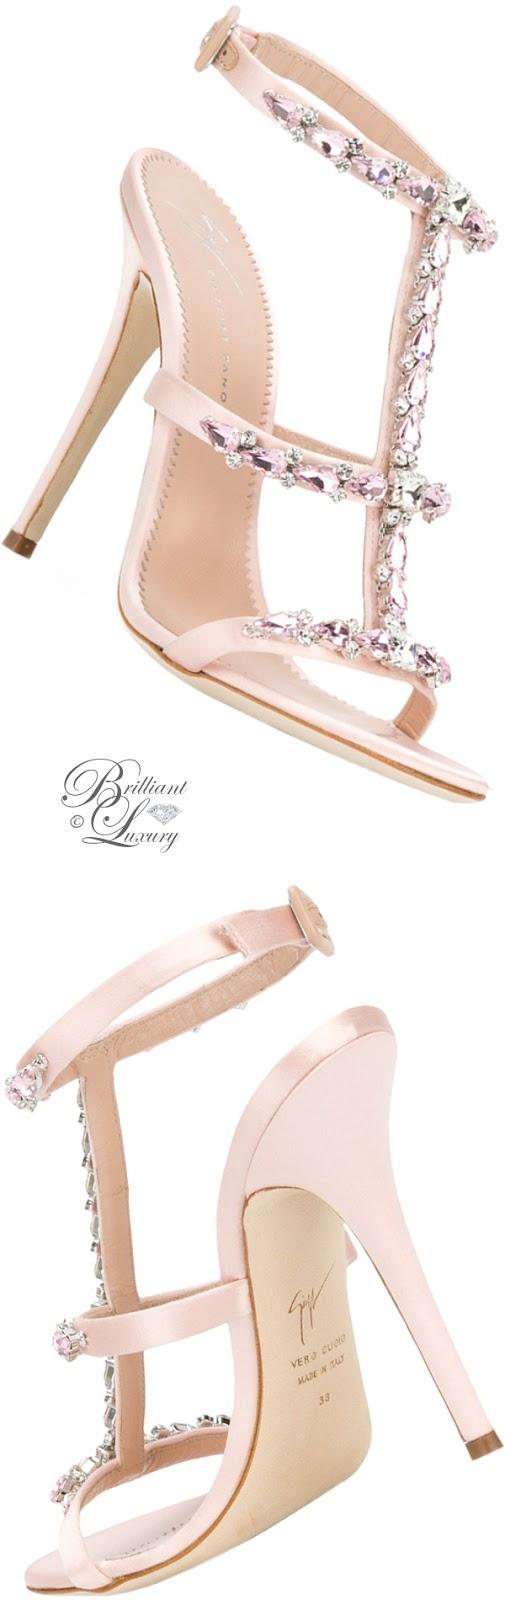 Brilliant Luxury ♦ Giuseppe Zanotti rhinestone T-bar sandals